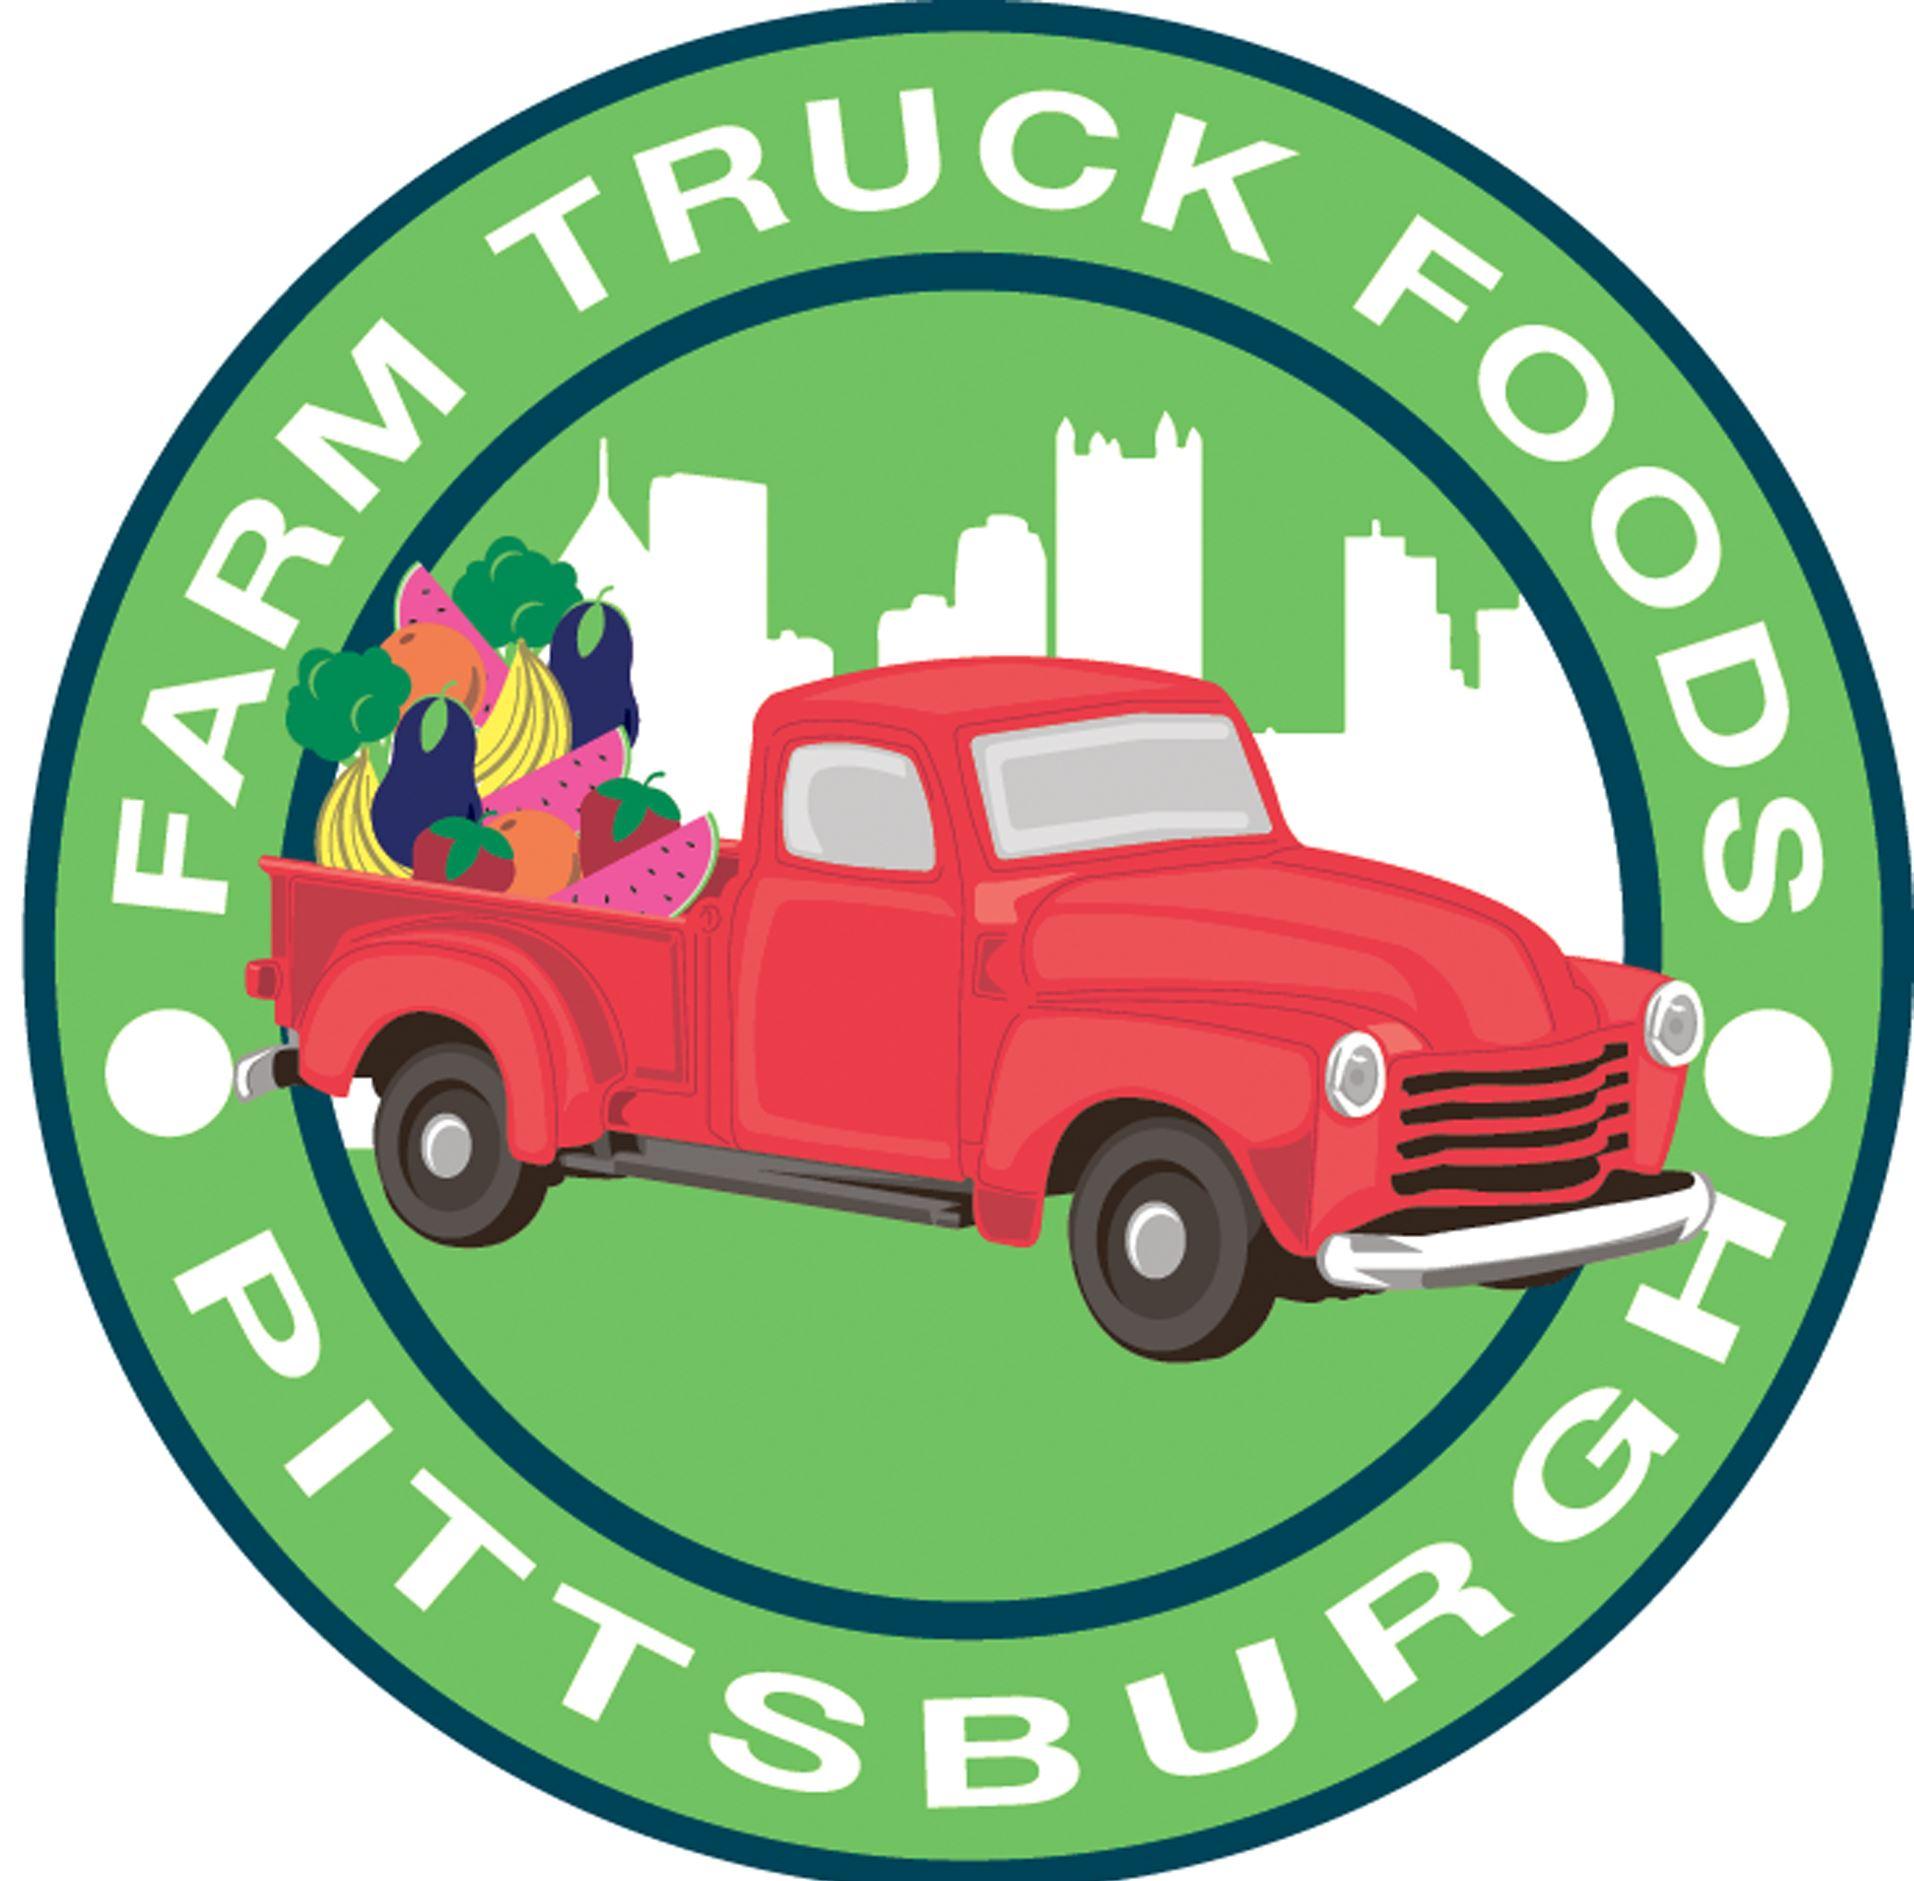 FarmTruckLogo-1 Farm Truck Foods logo.